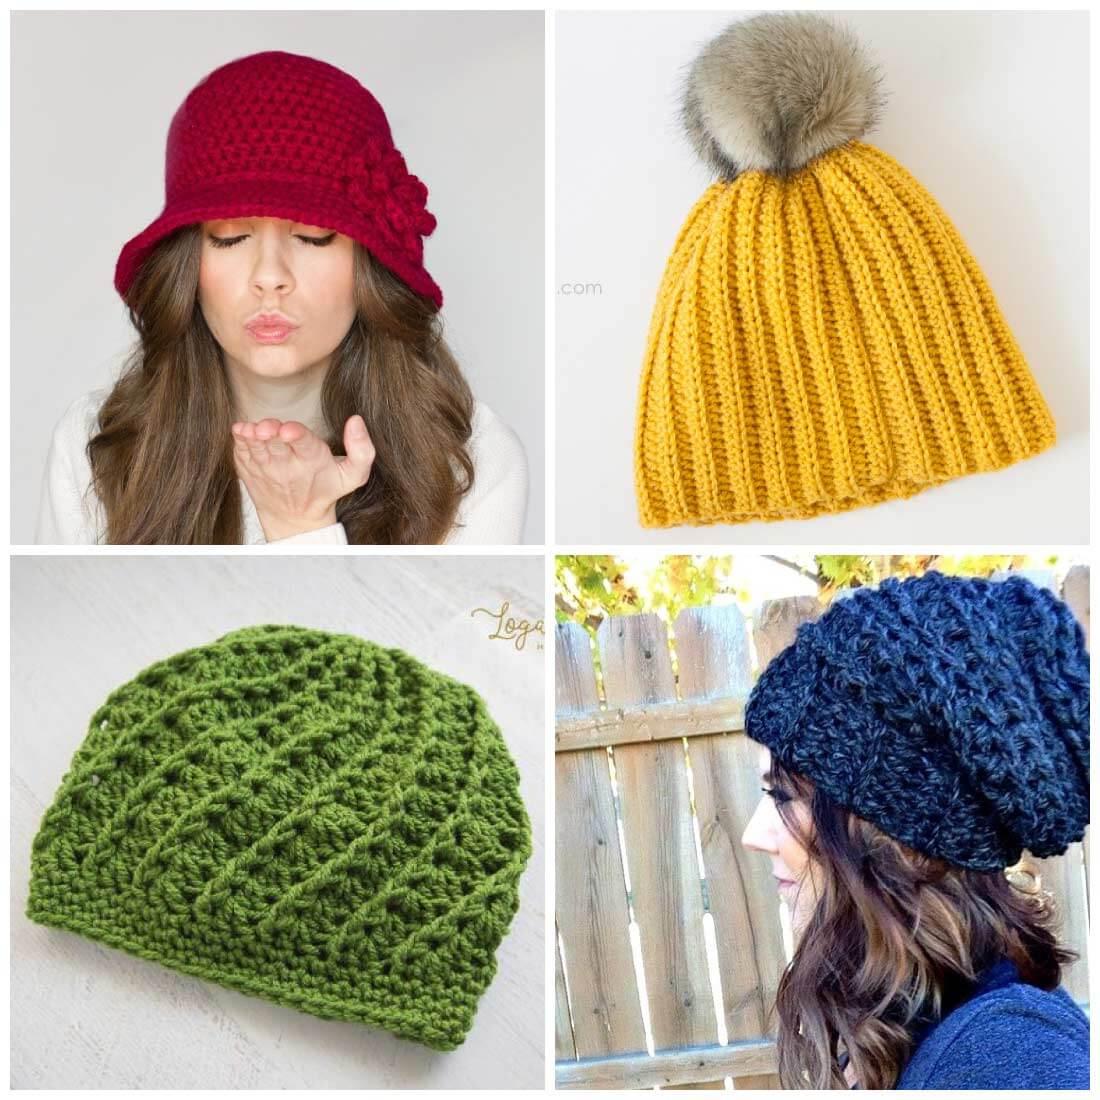 free crochet hat patterns | free crochet patterns | crochet patterns | use  these WSIVNHW